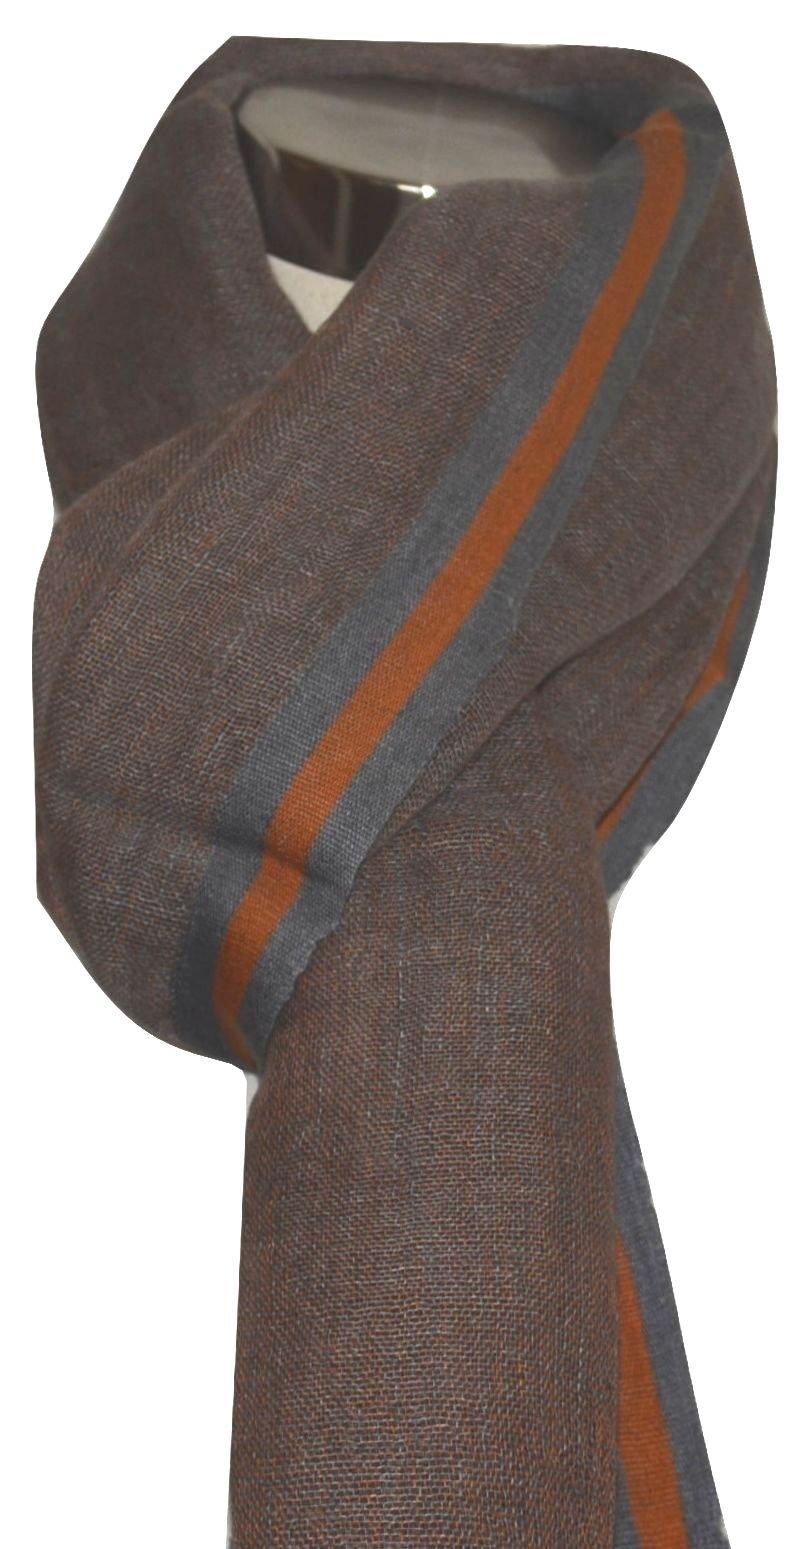 Hand Spun, Handwoven Shorty Weave Pure Linen Fabric Triple Stripe edge Scarf. X1424